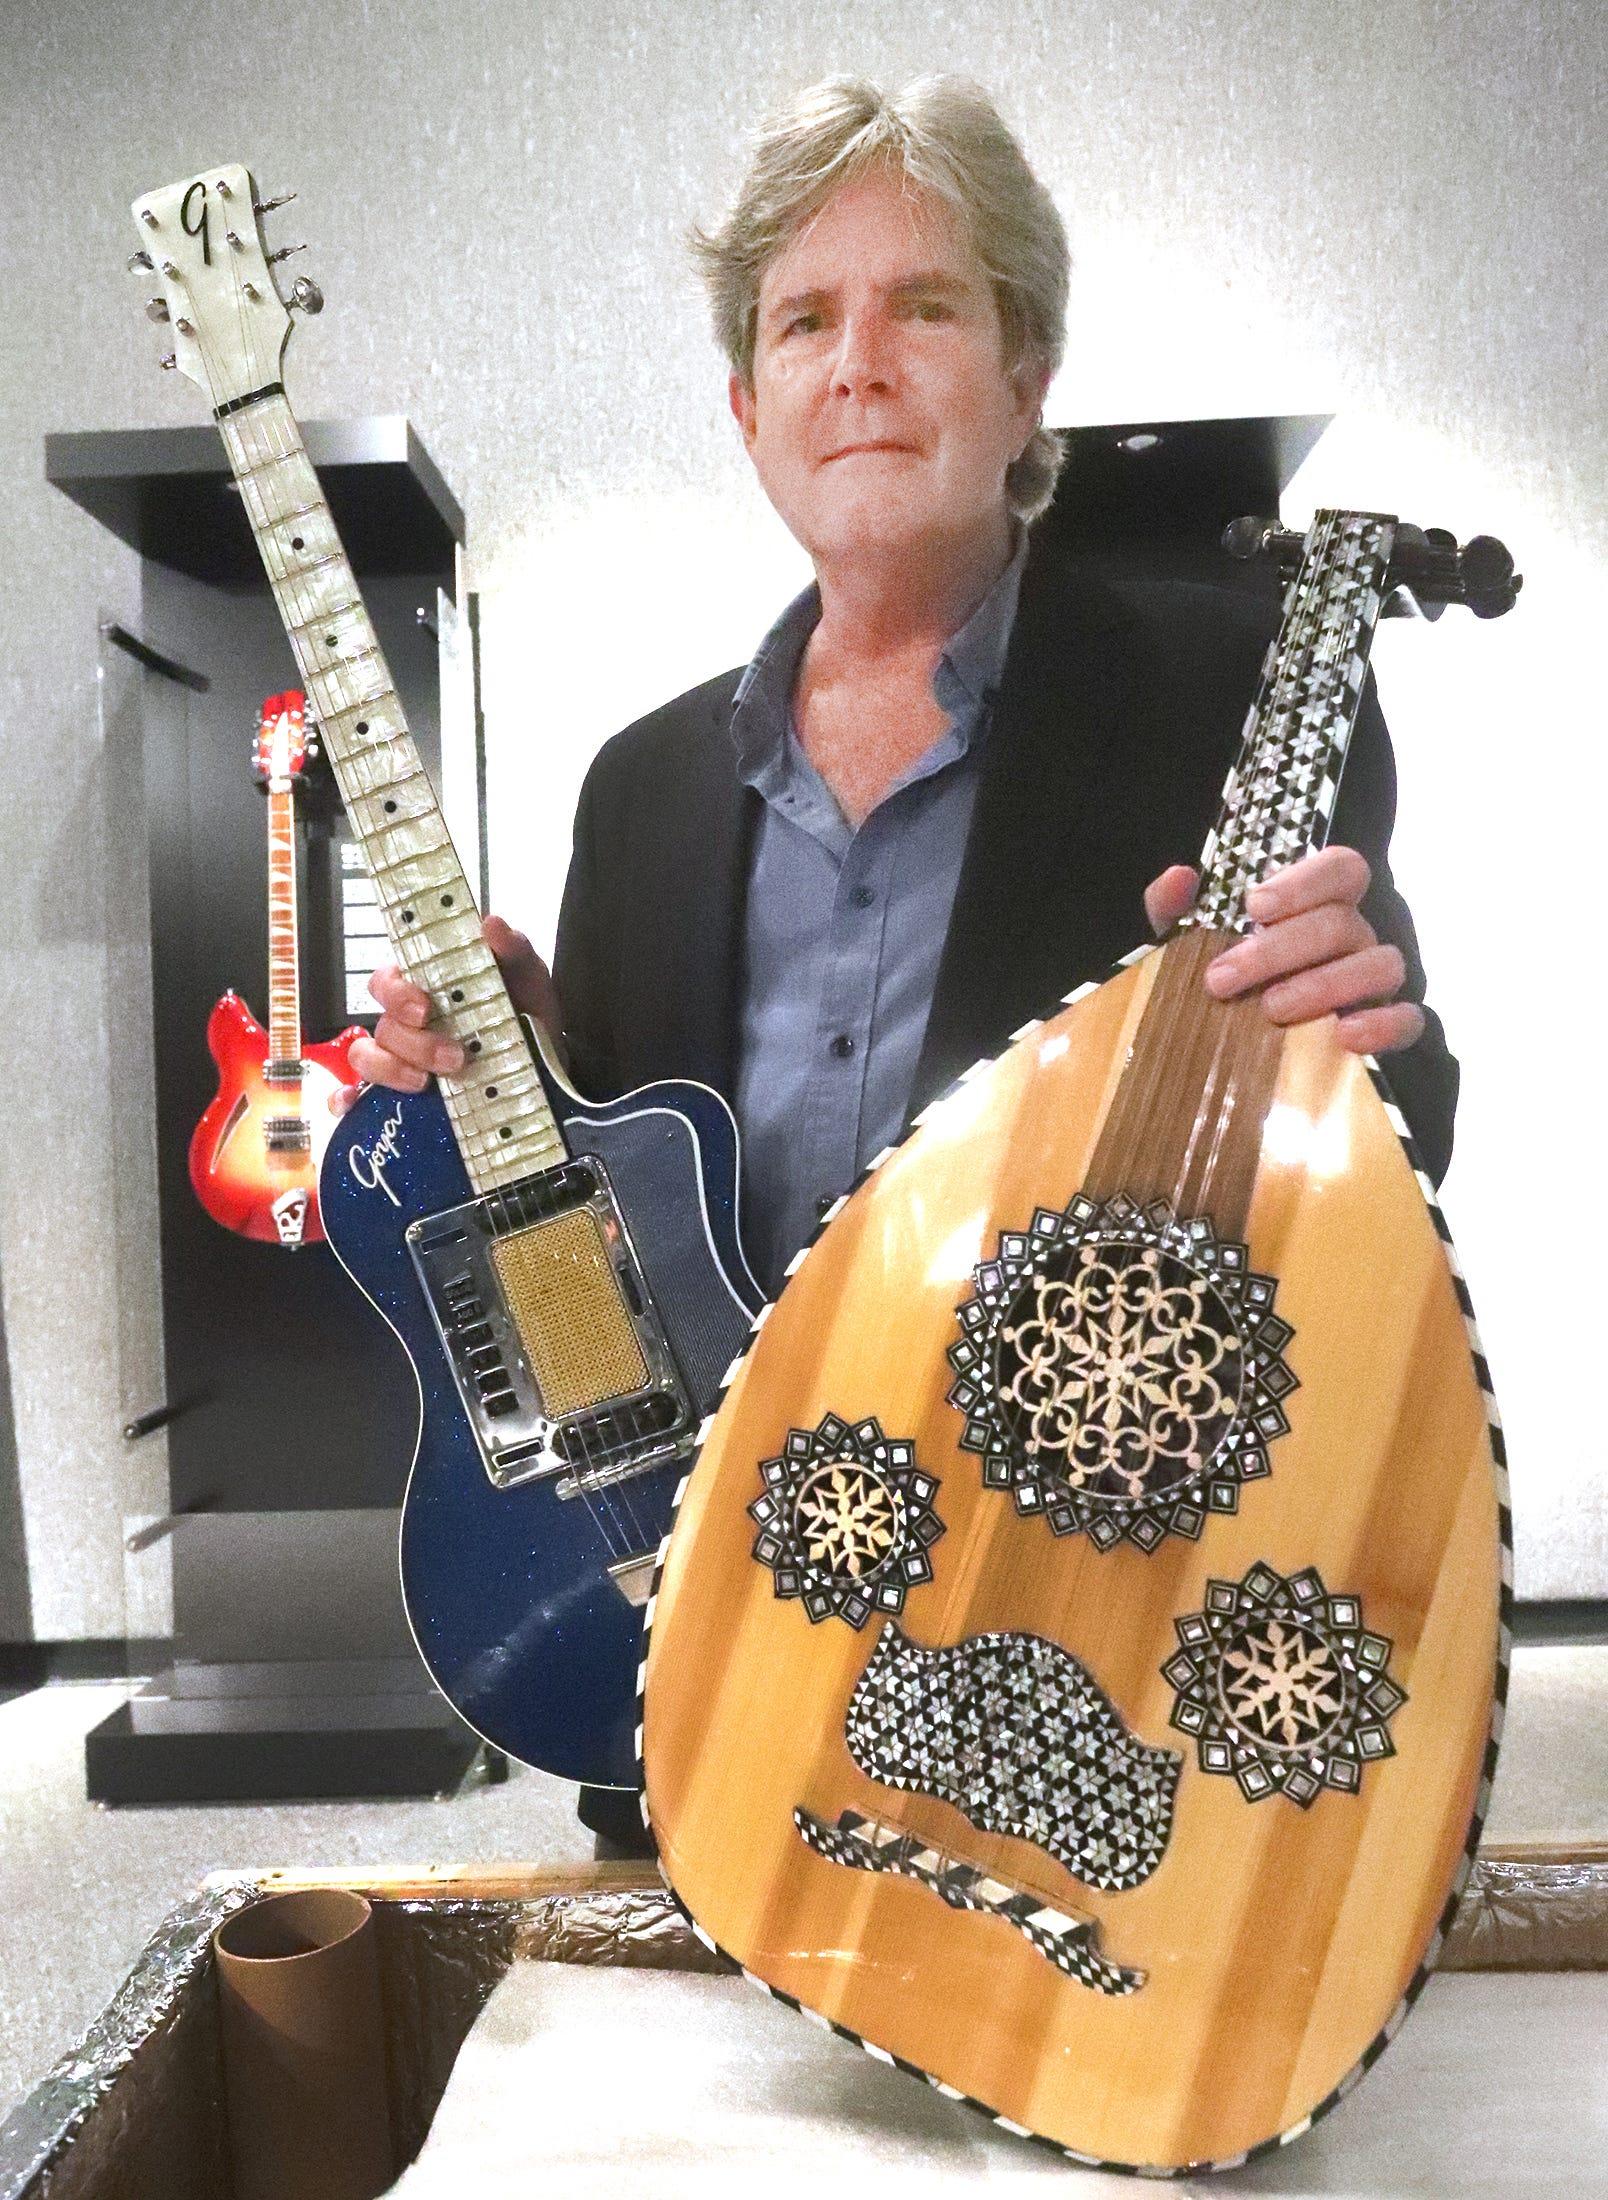 Exhibit highlights artistic development of guitars through history, at MOAS in Daytona